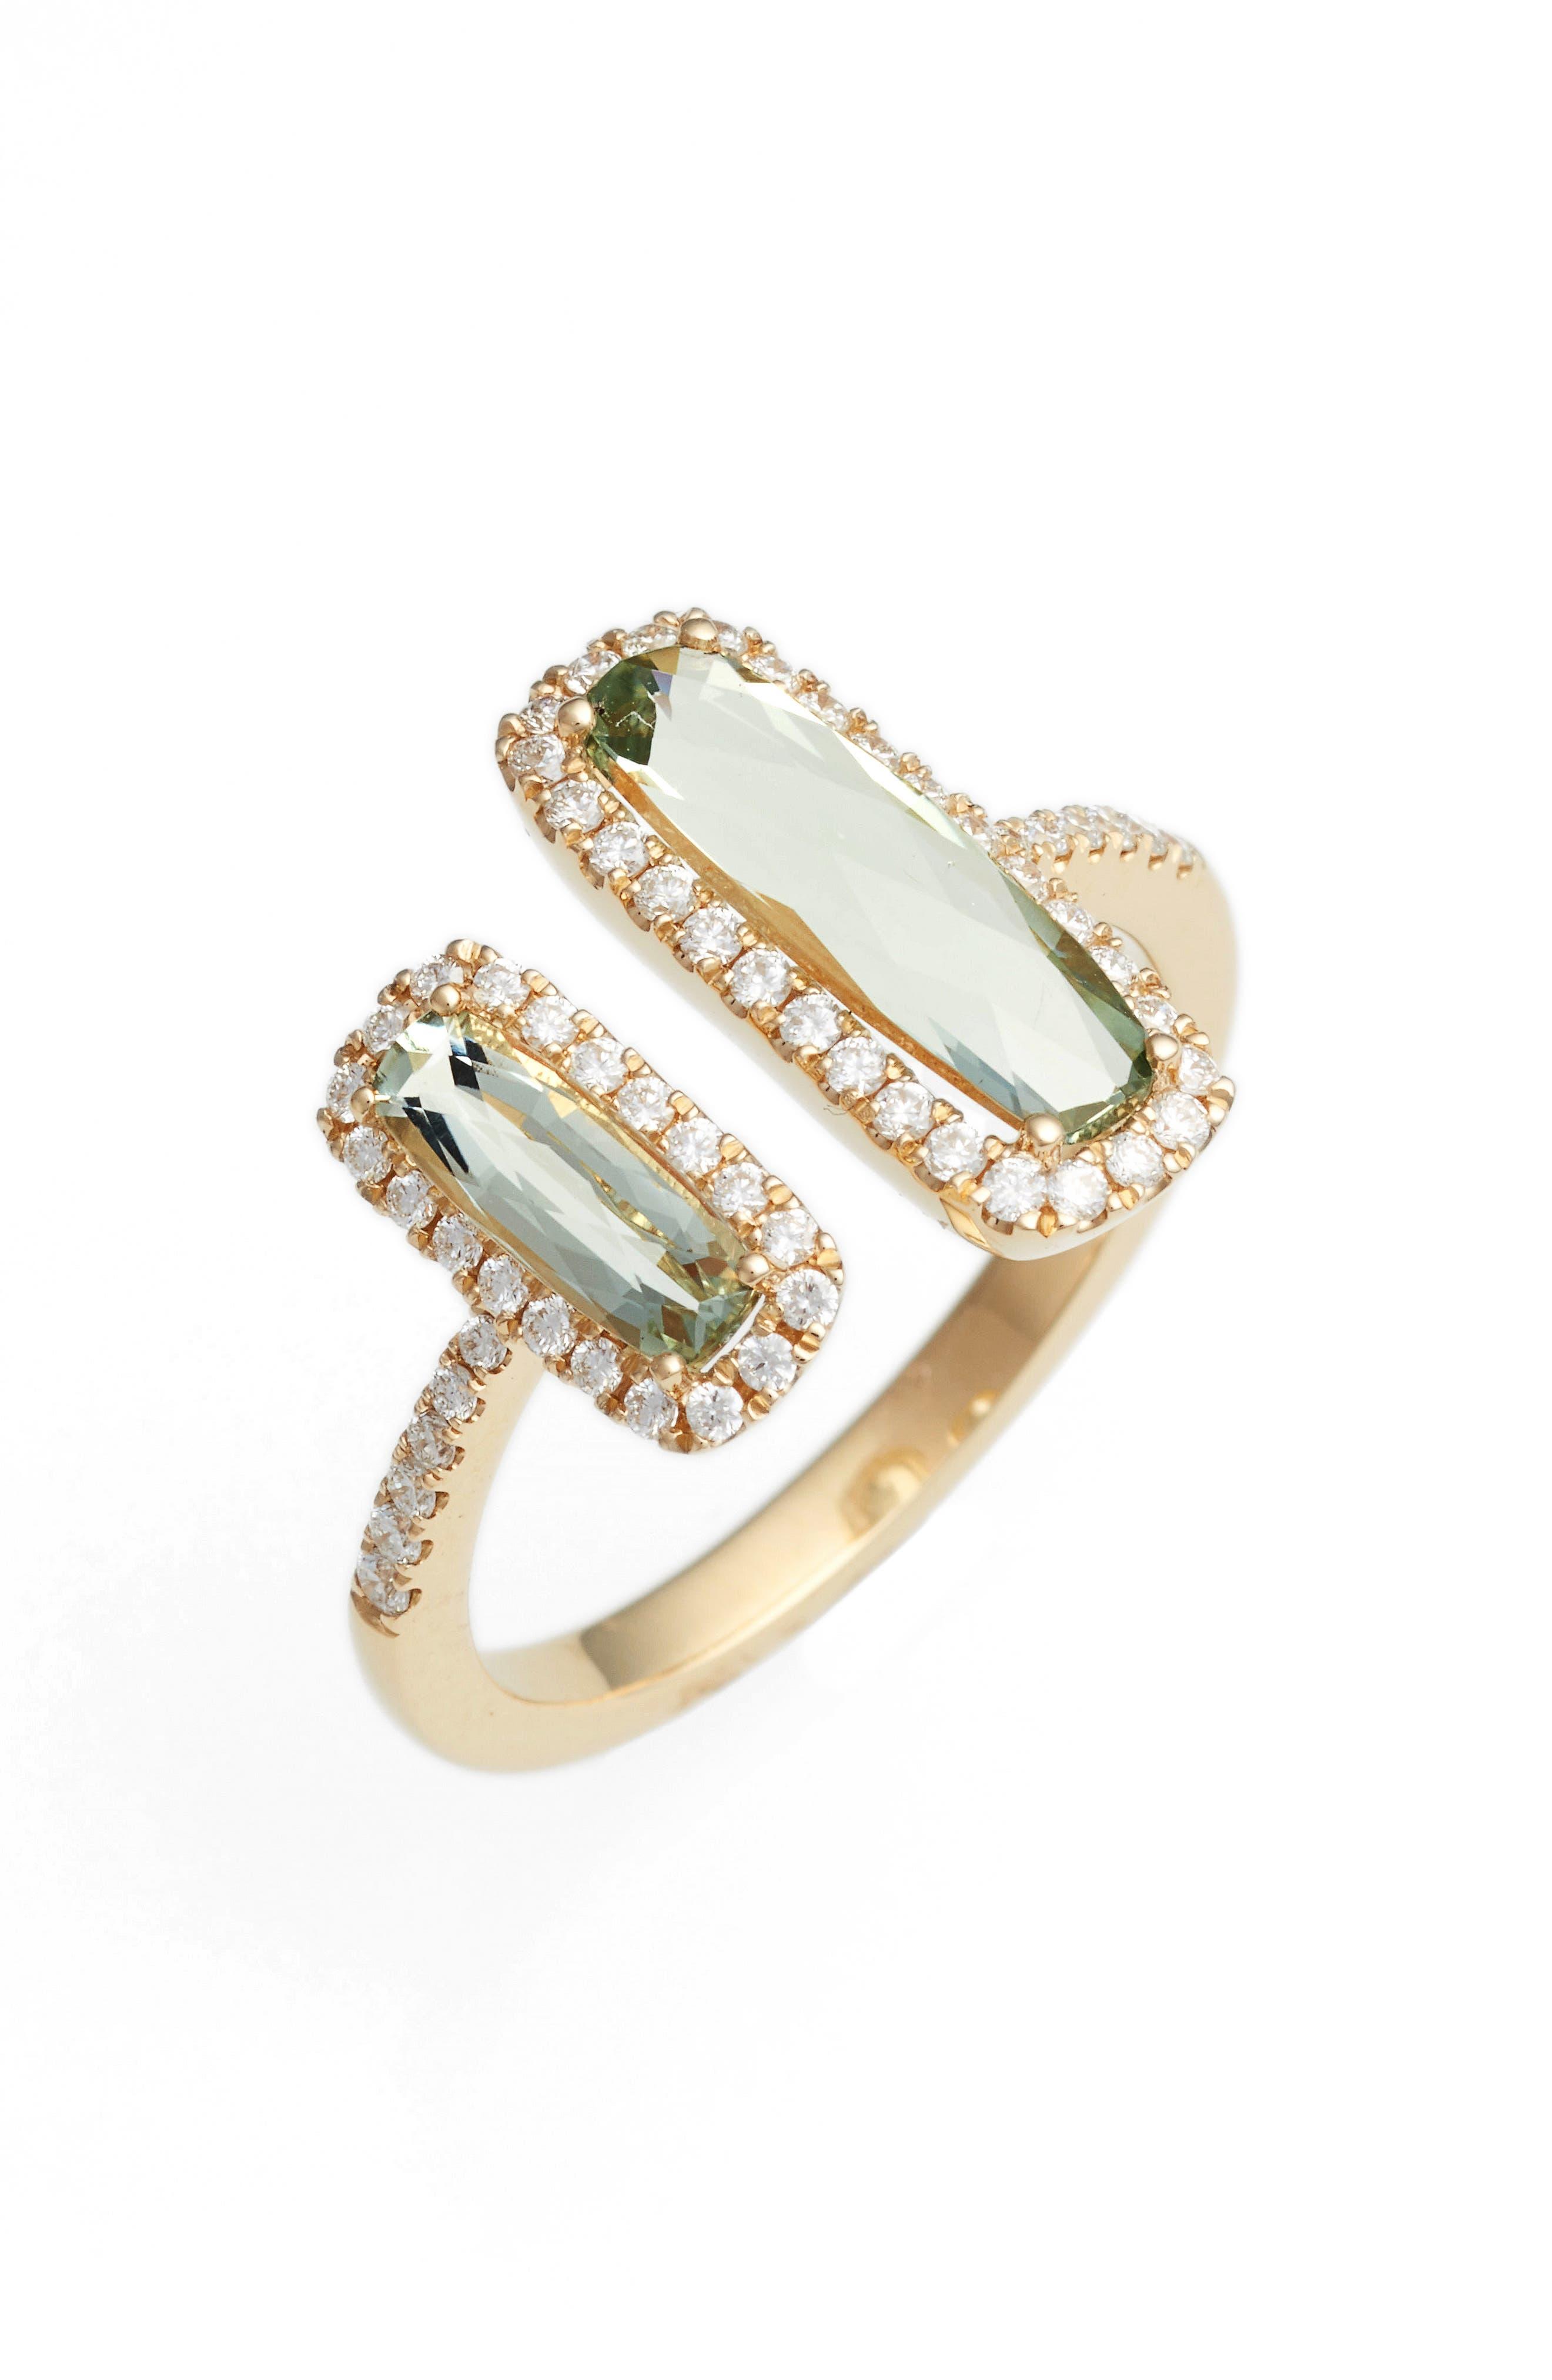 Iris Diamond & Semiprecious Stone Open Ring,                         Main,                         color, Yellow Gold/ Green Amethyst